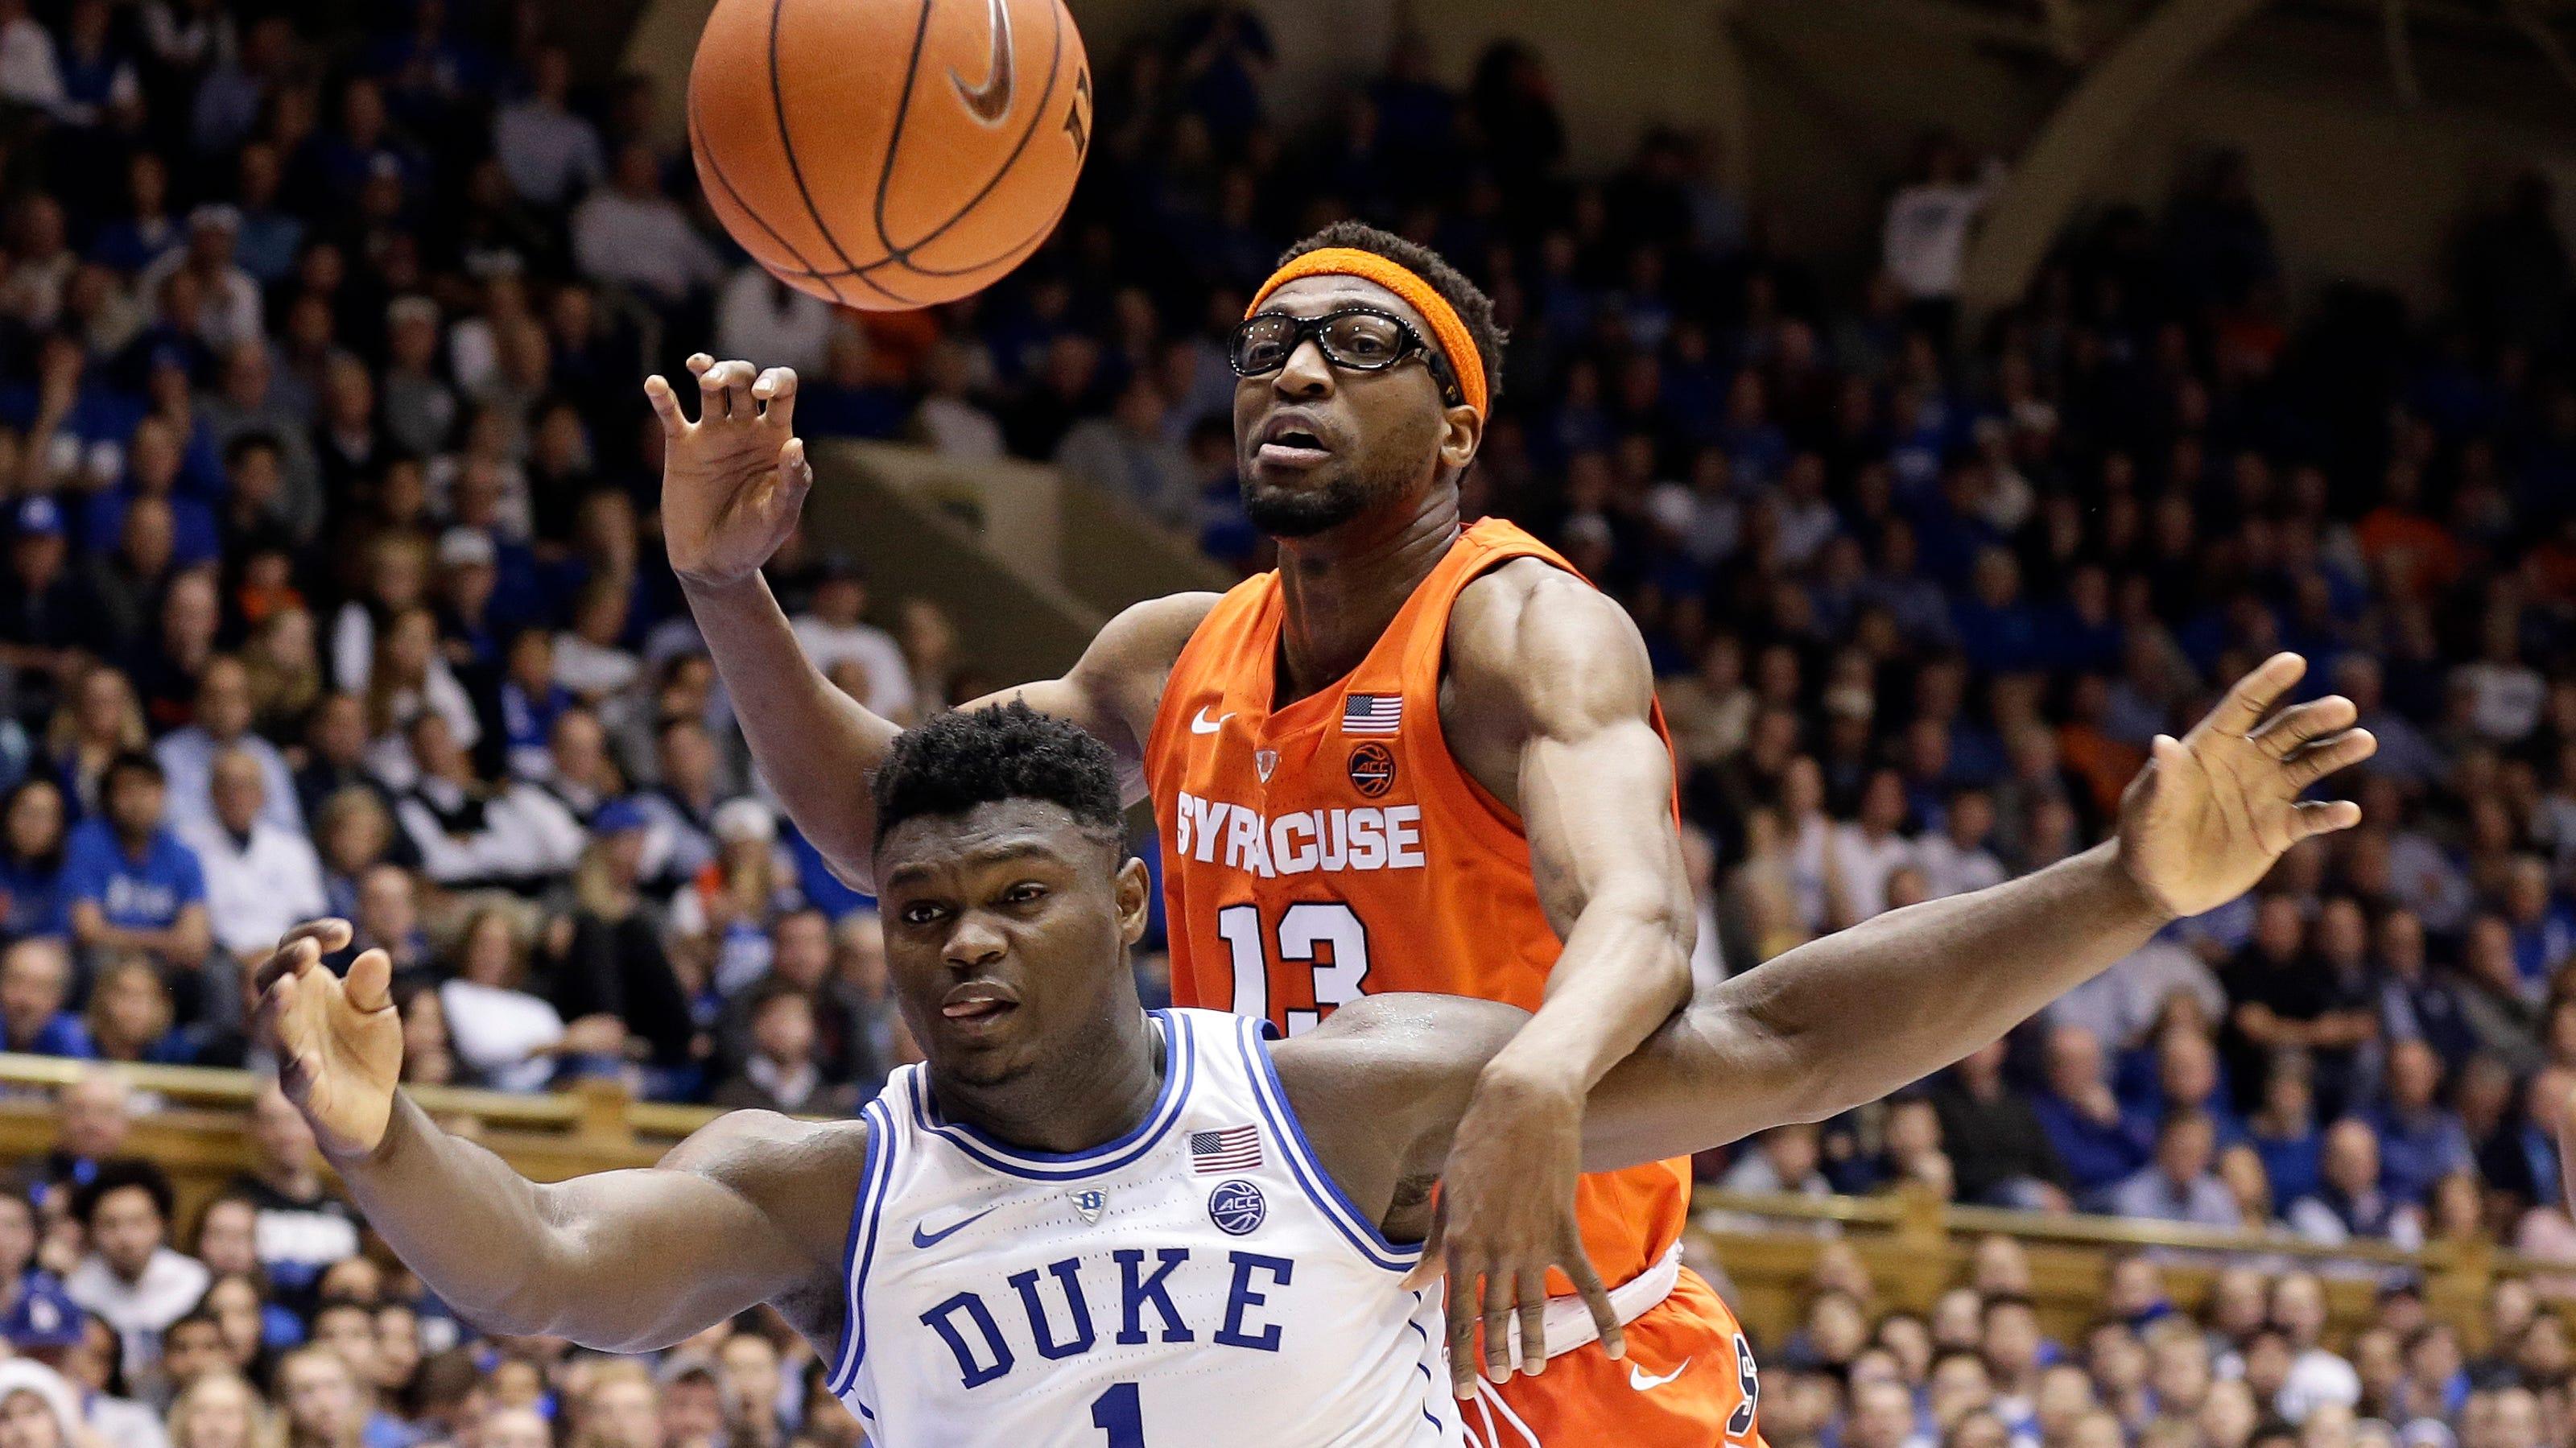 Syracuse Upsets No 1 Duke 95 91 In Ot After Jones Injury